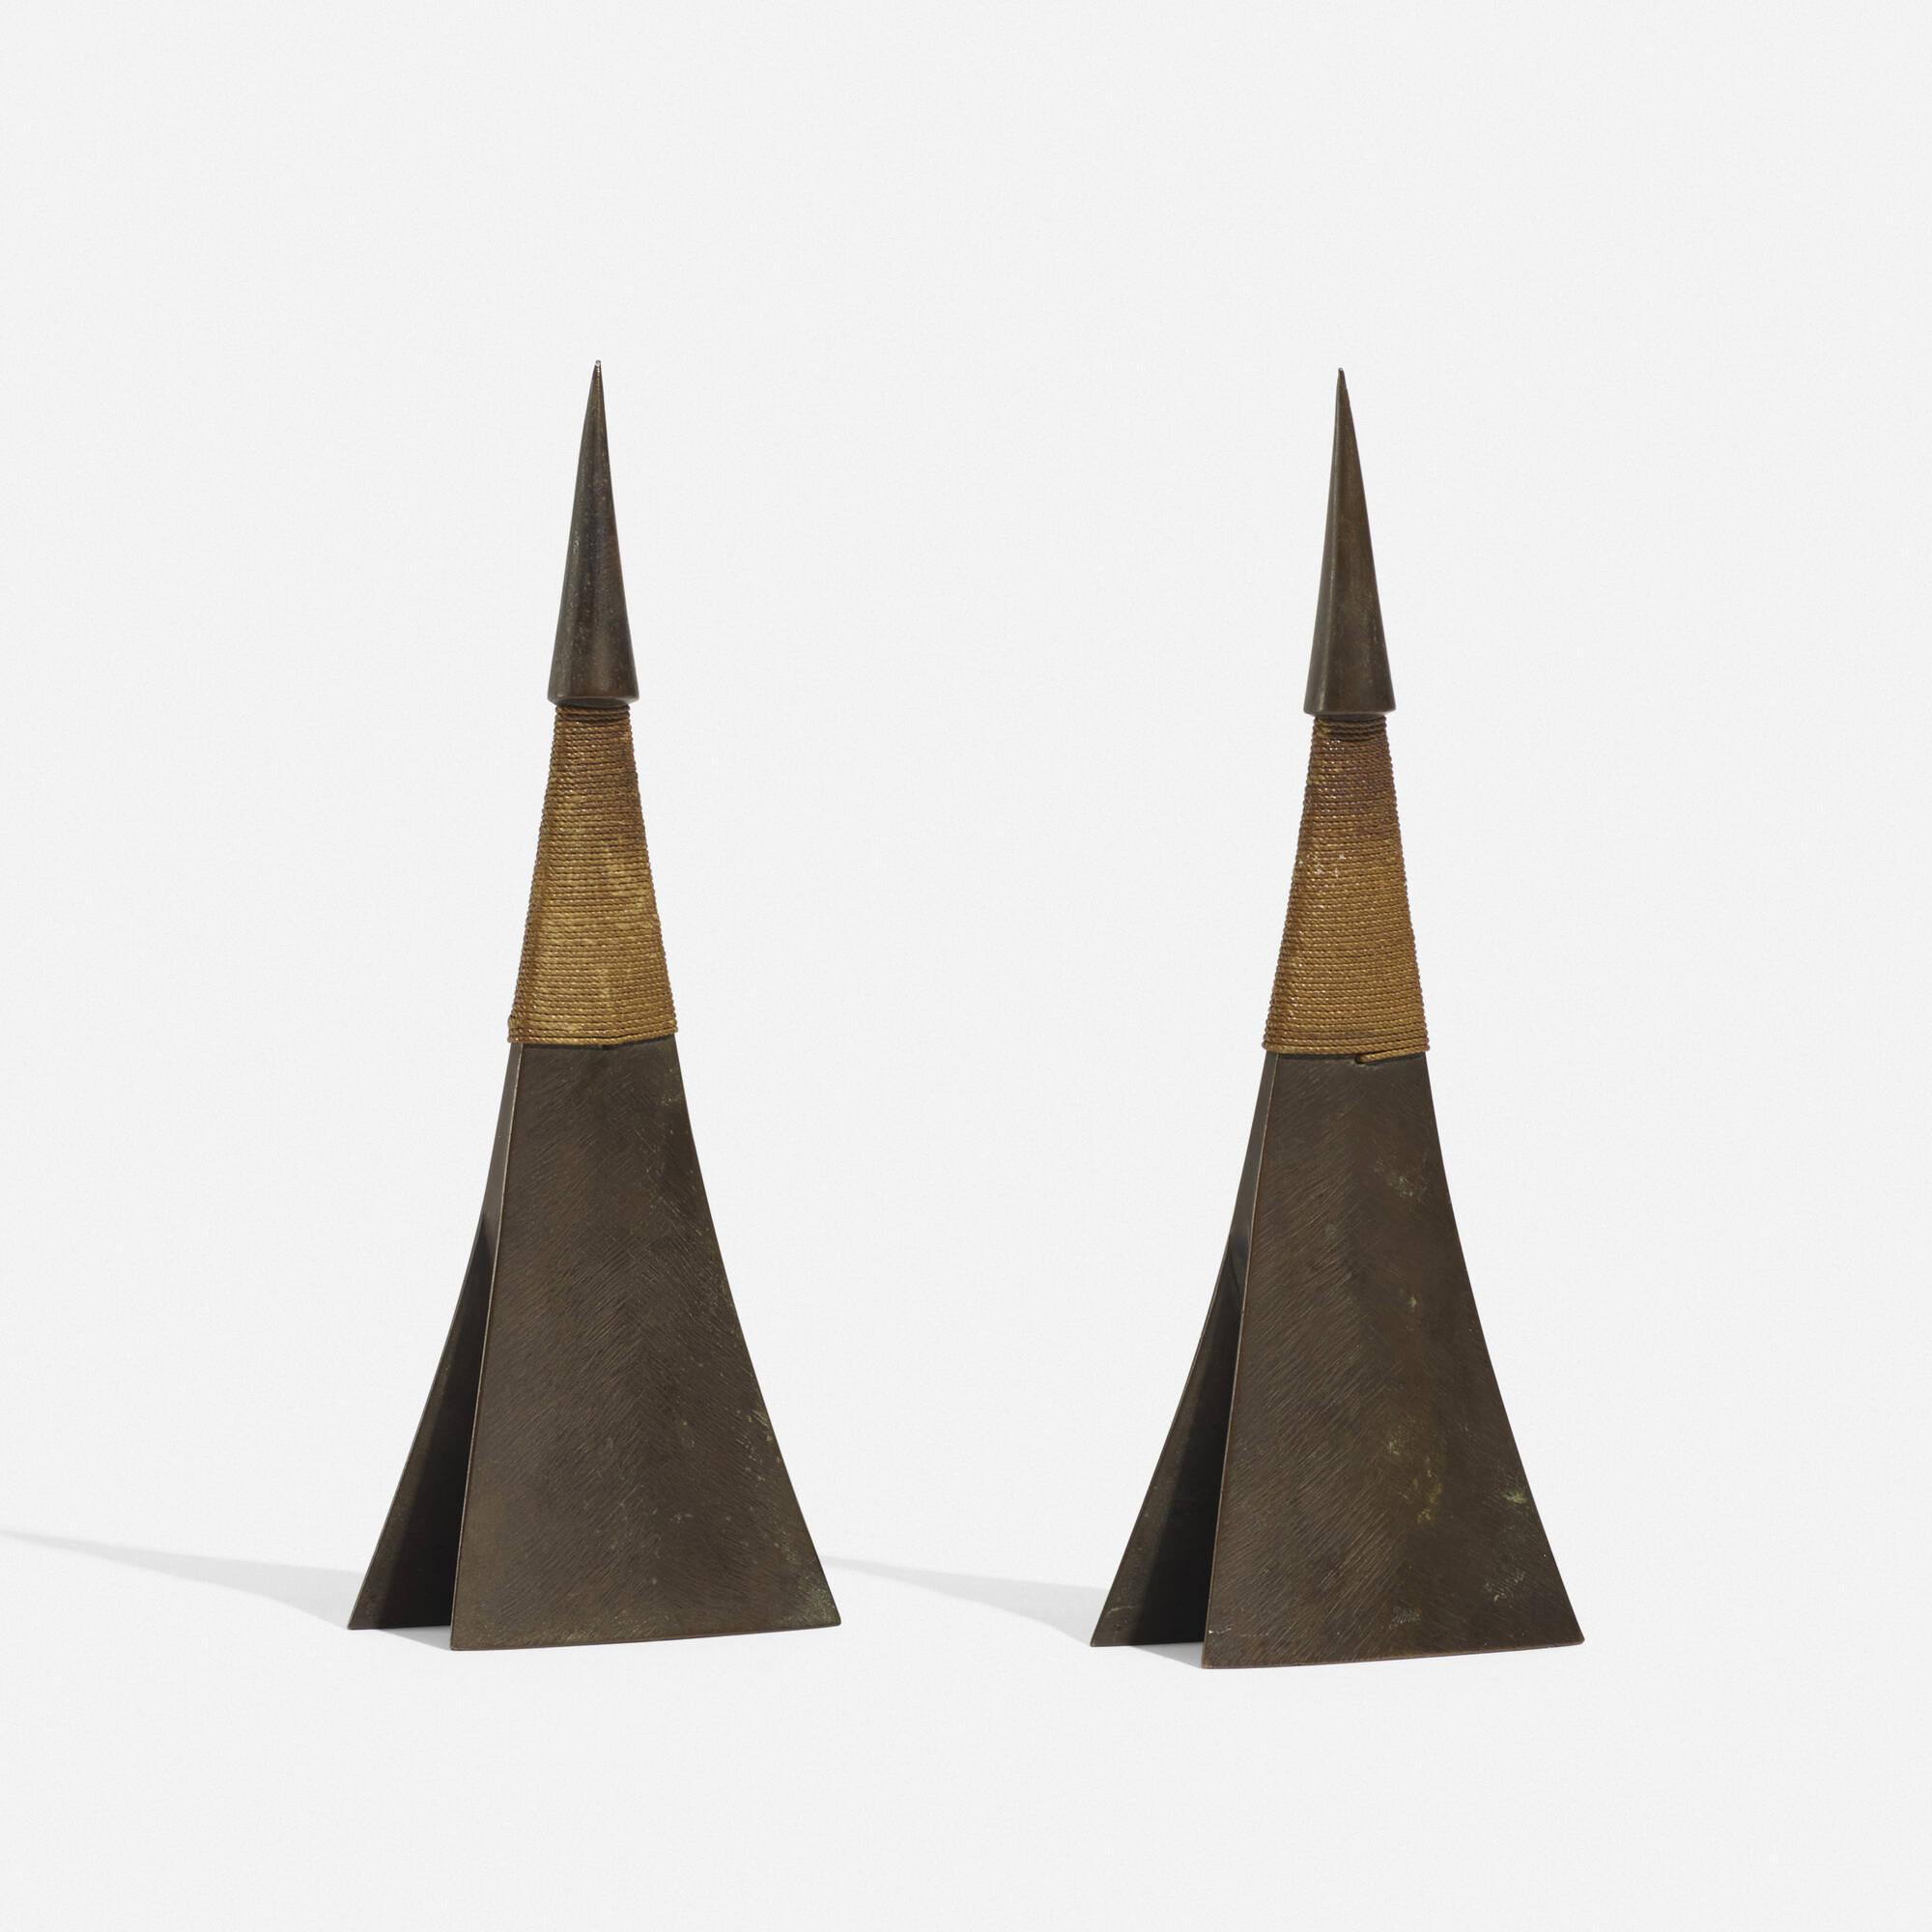 260: Carl Auböck II / rare candlesticks model 3502, pair (1 of 3)